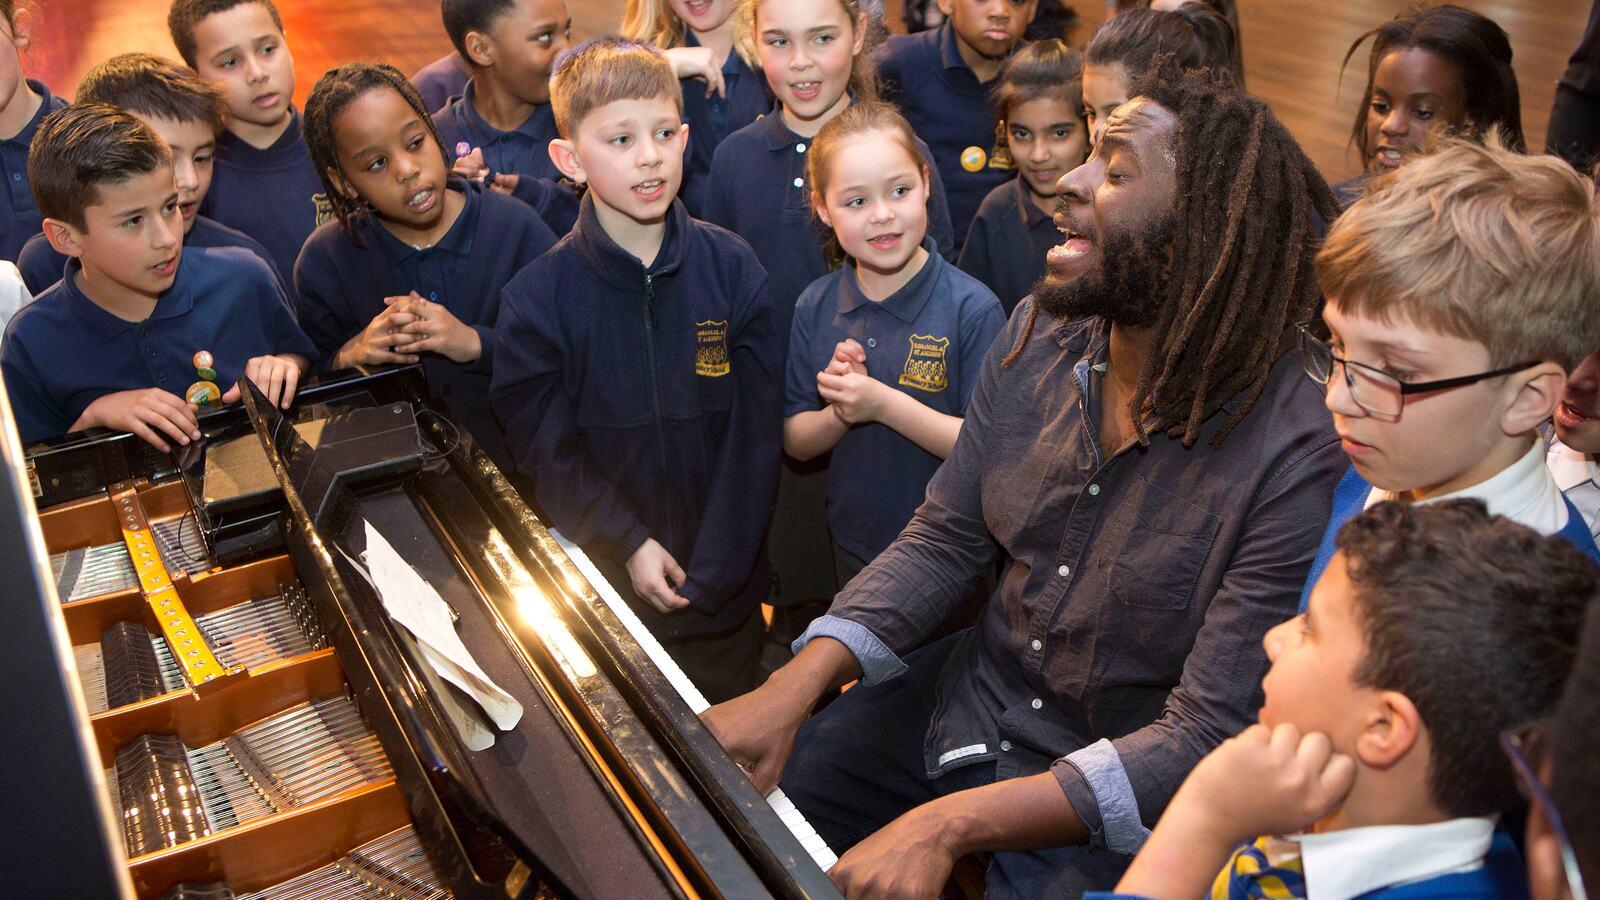 School children singing next to a piano